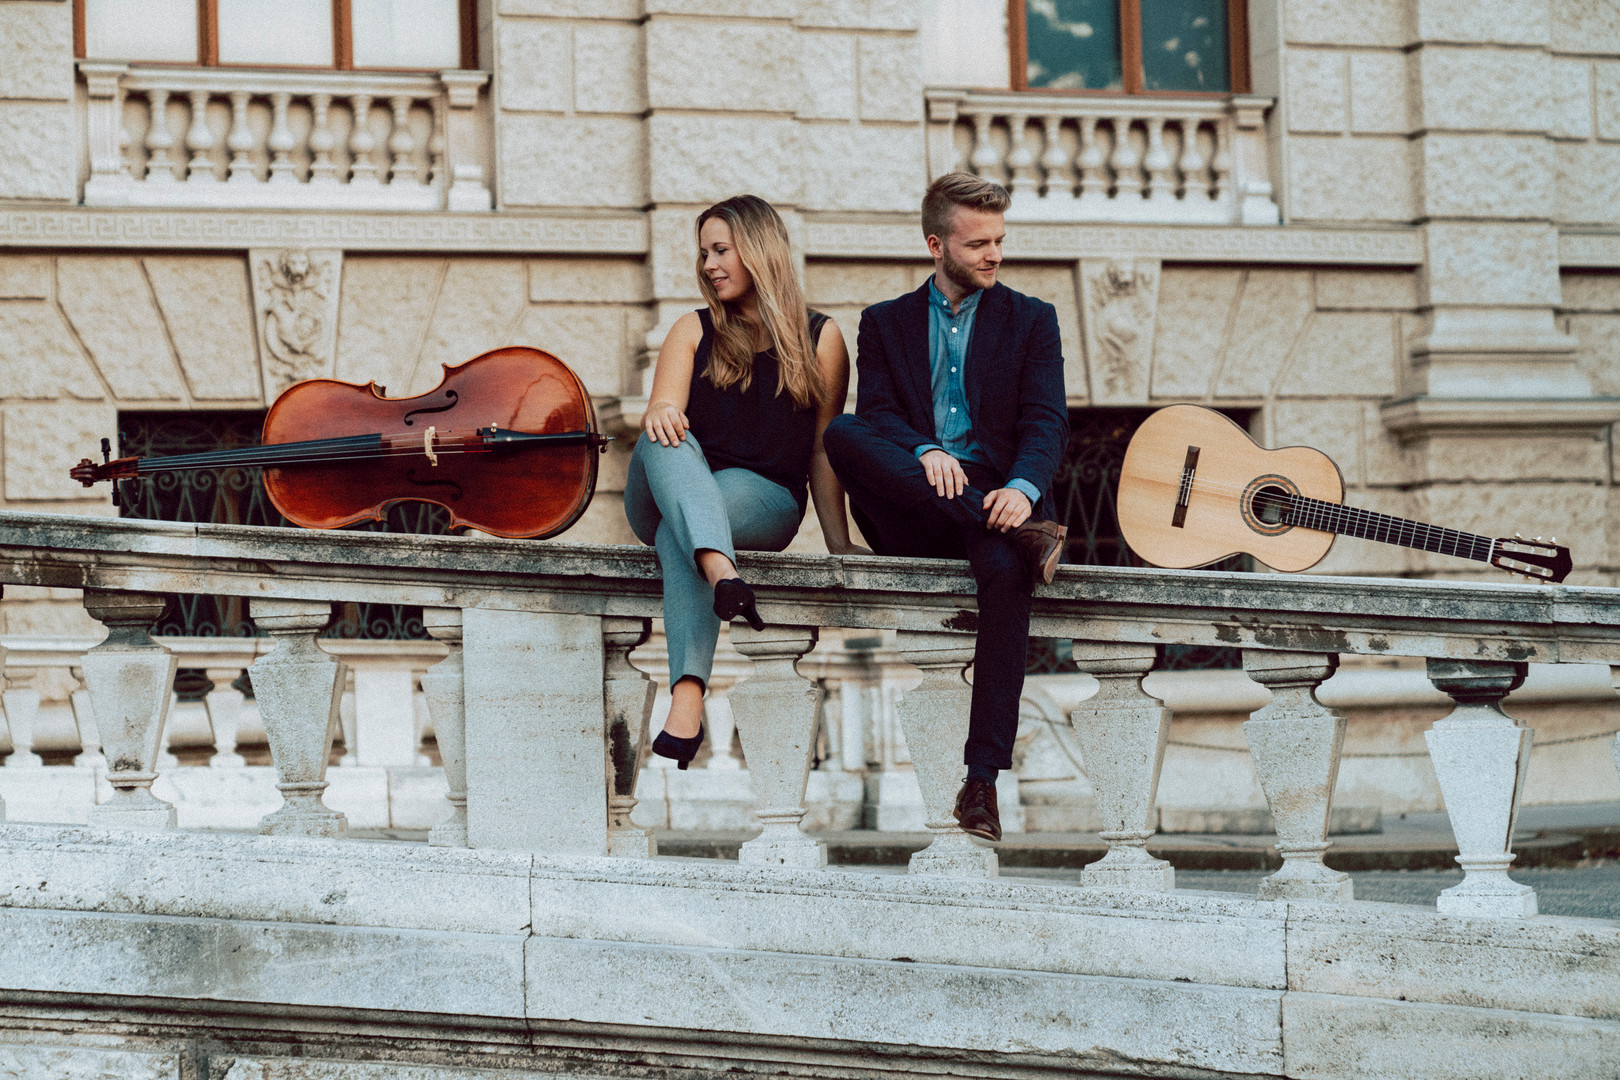 David e Mia - Instruments